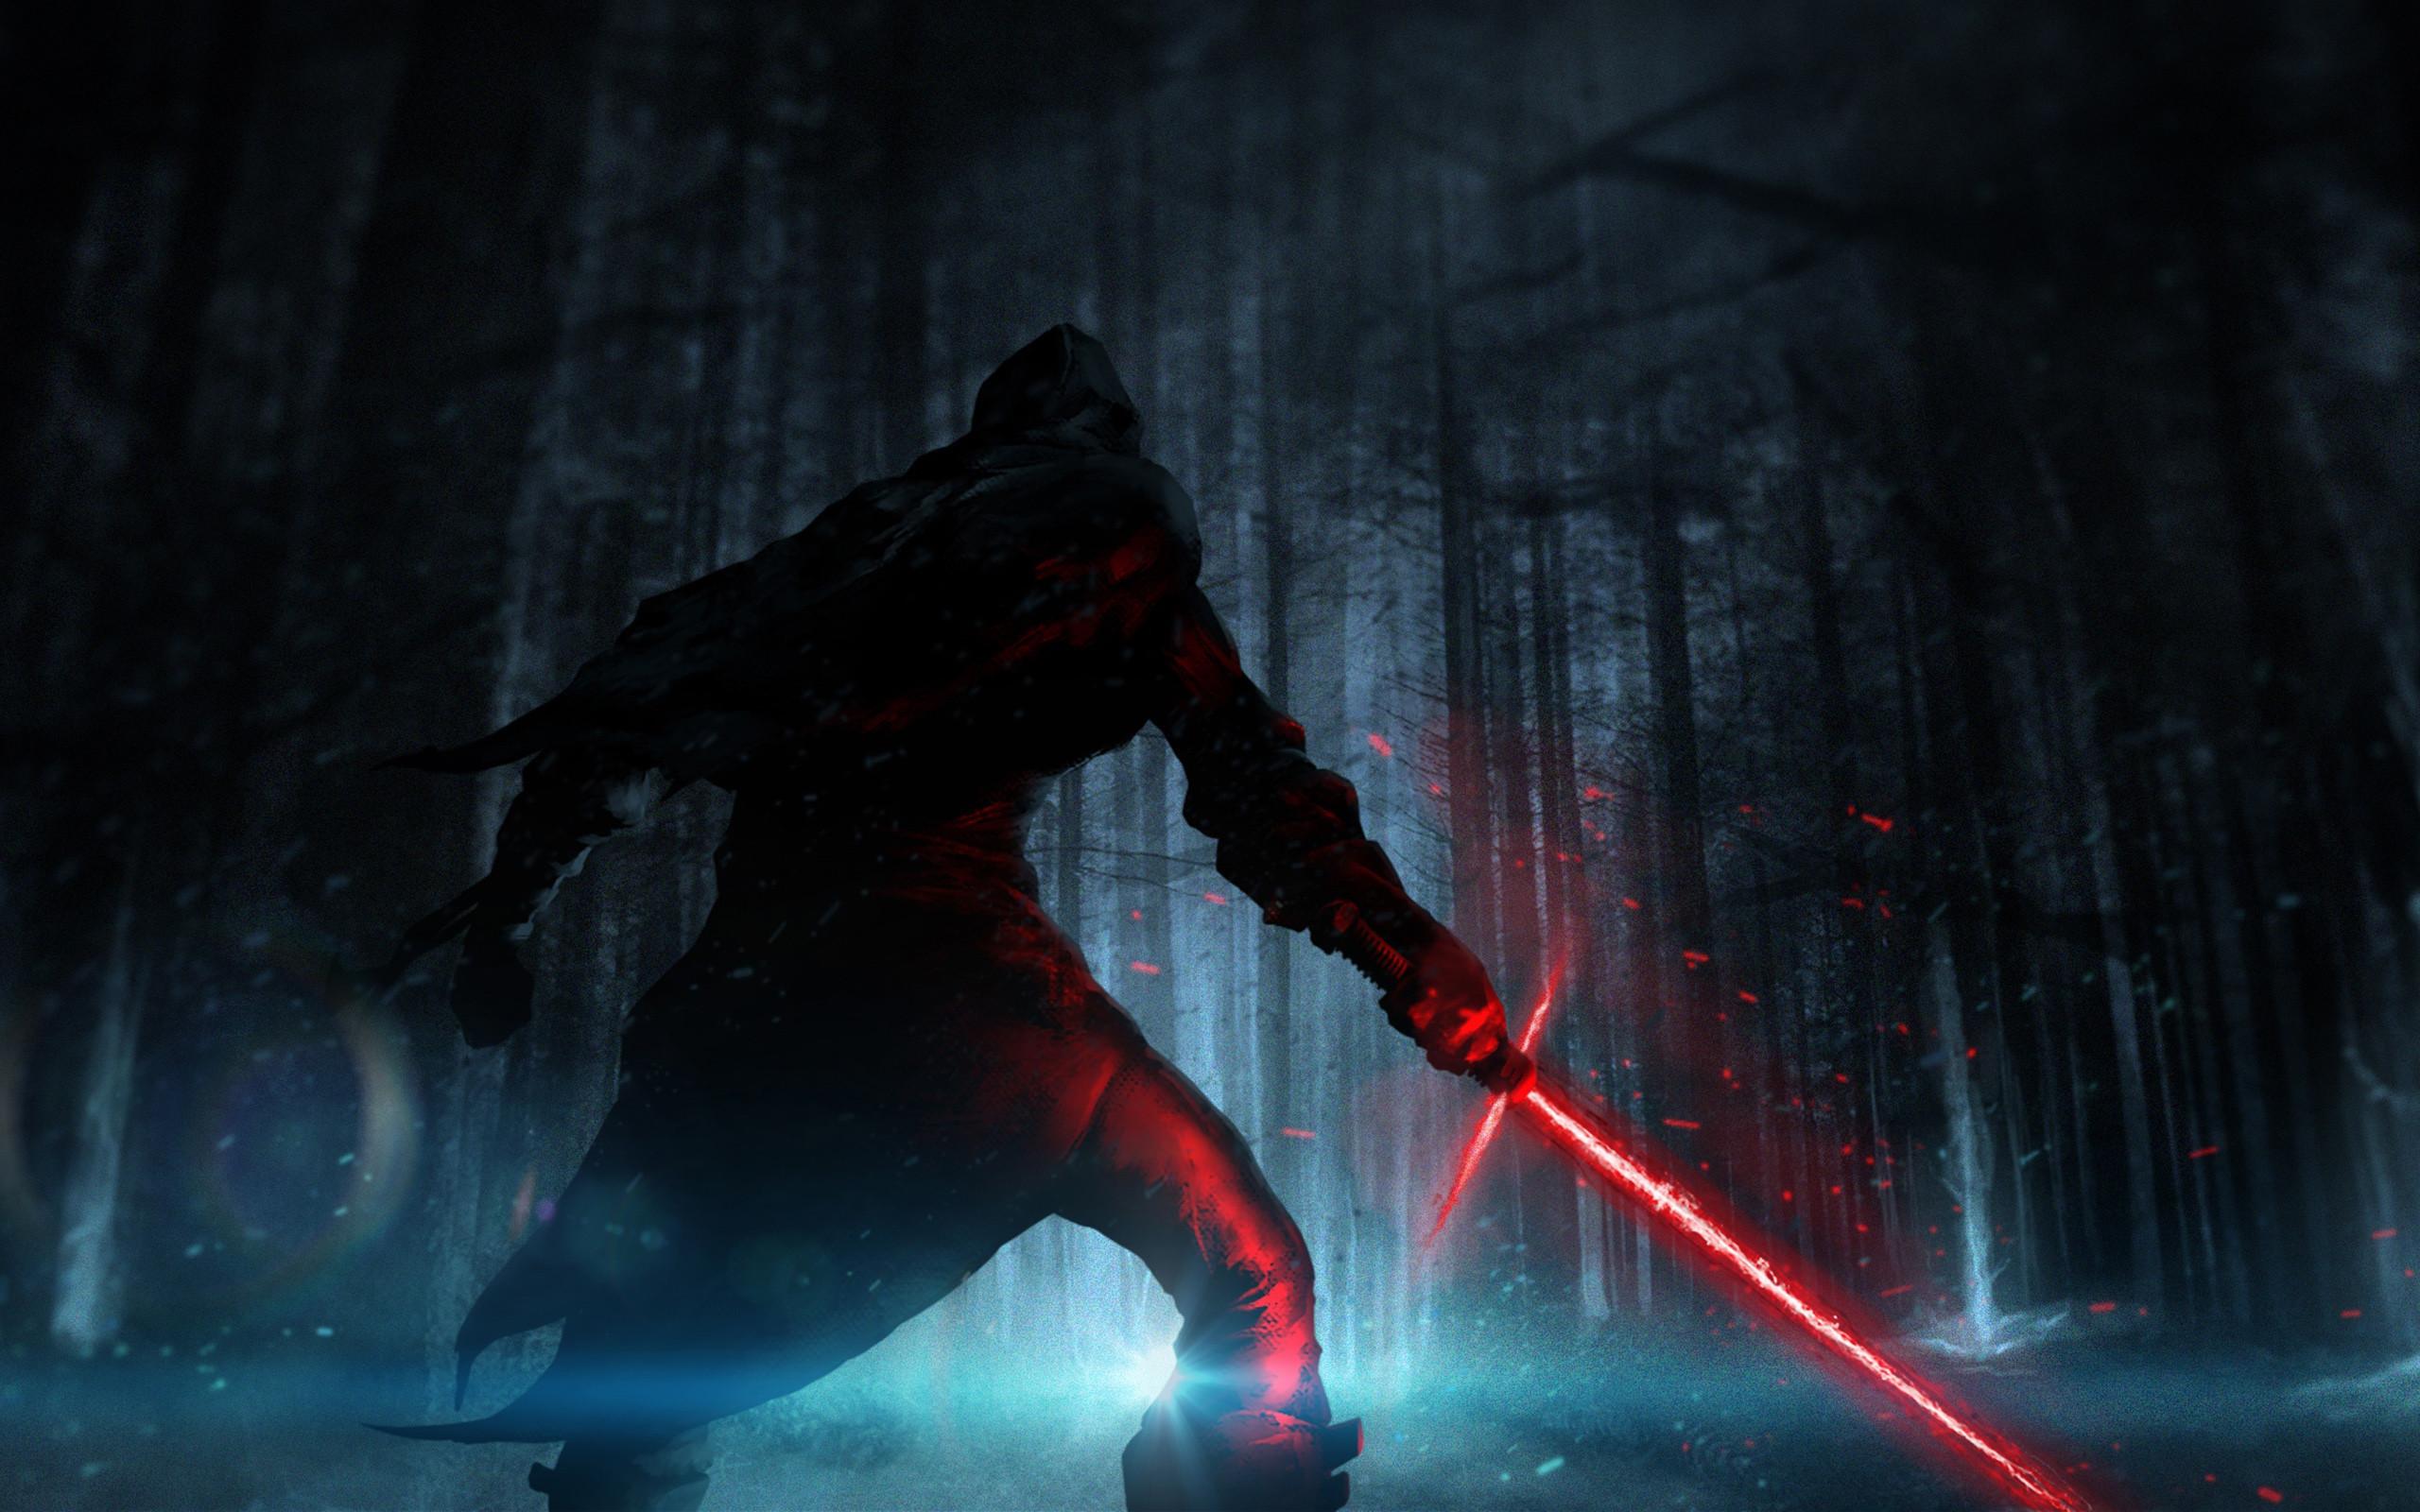 Star Wars The Force Awakens Wallpapers Desktop Background For Desktop  Wallpaper 2560 x 1600 px 1.2